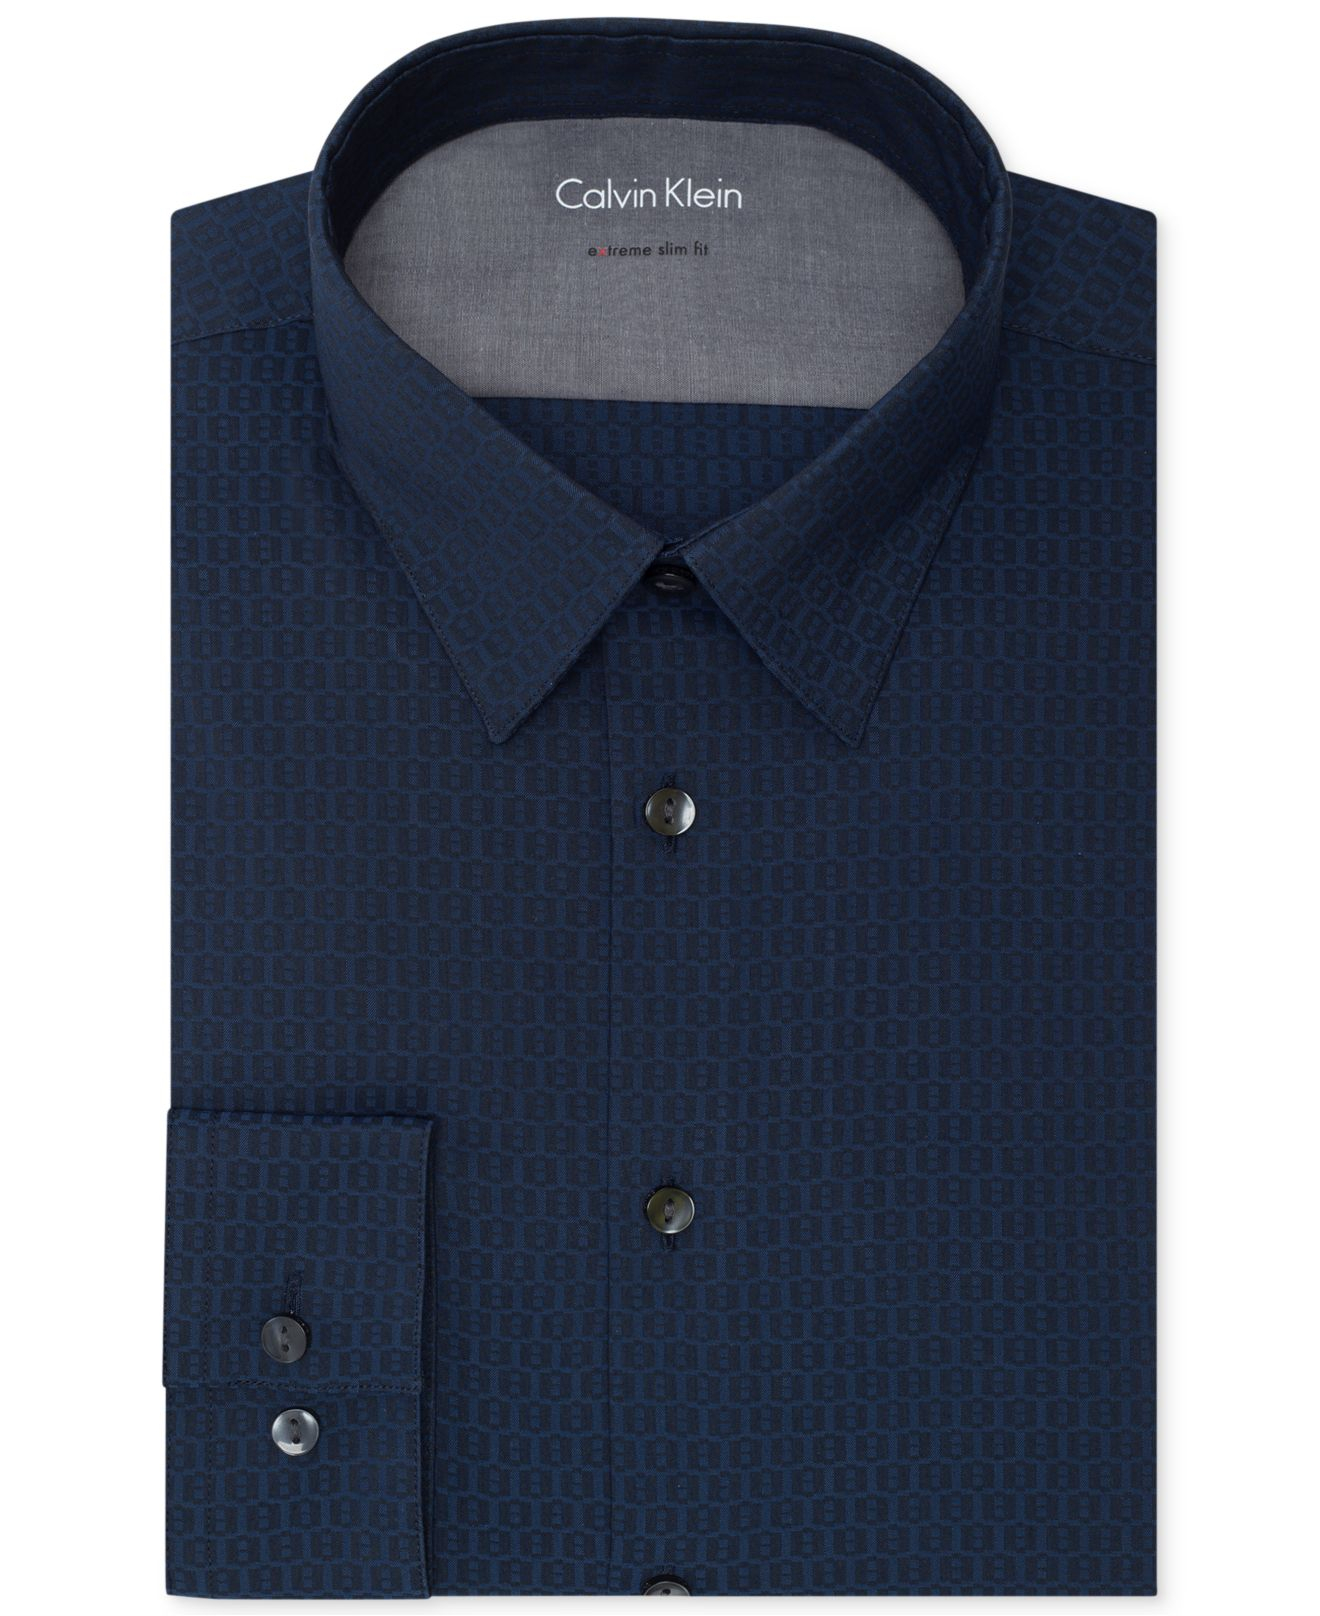 Calvin klein x extra slim fit deep blue print dress shirt for Calvin klein x fit dress shirt